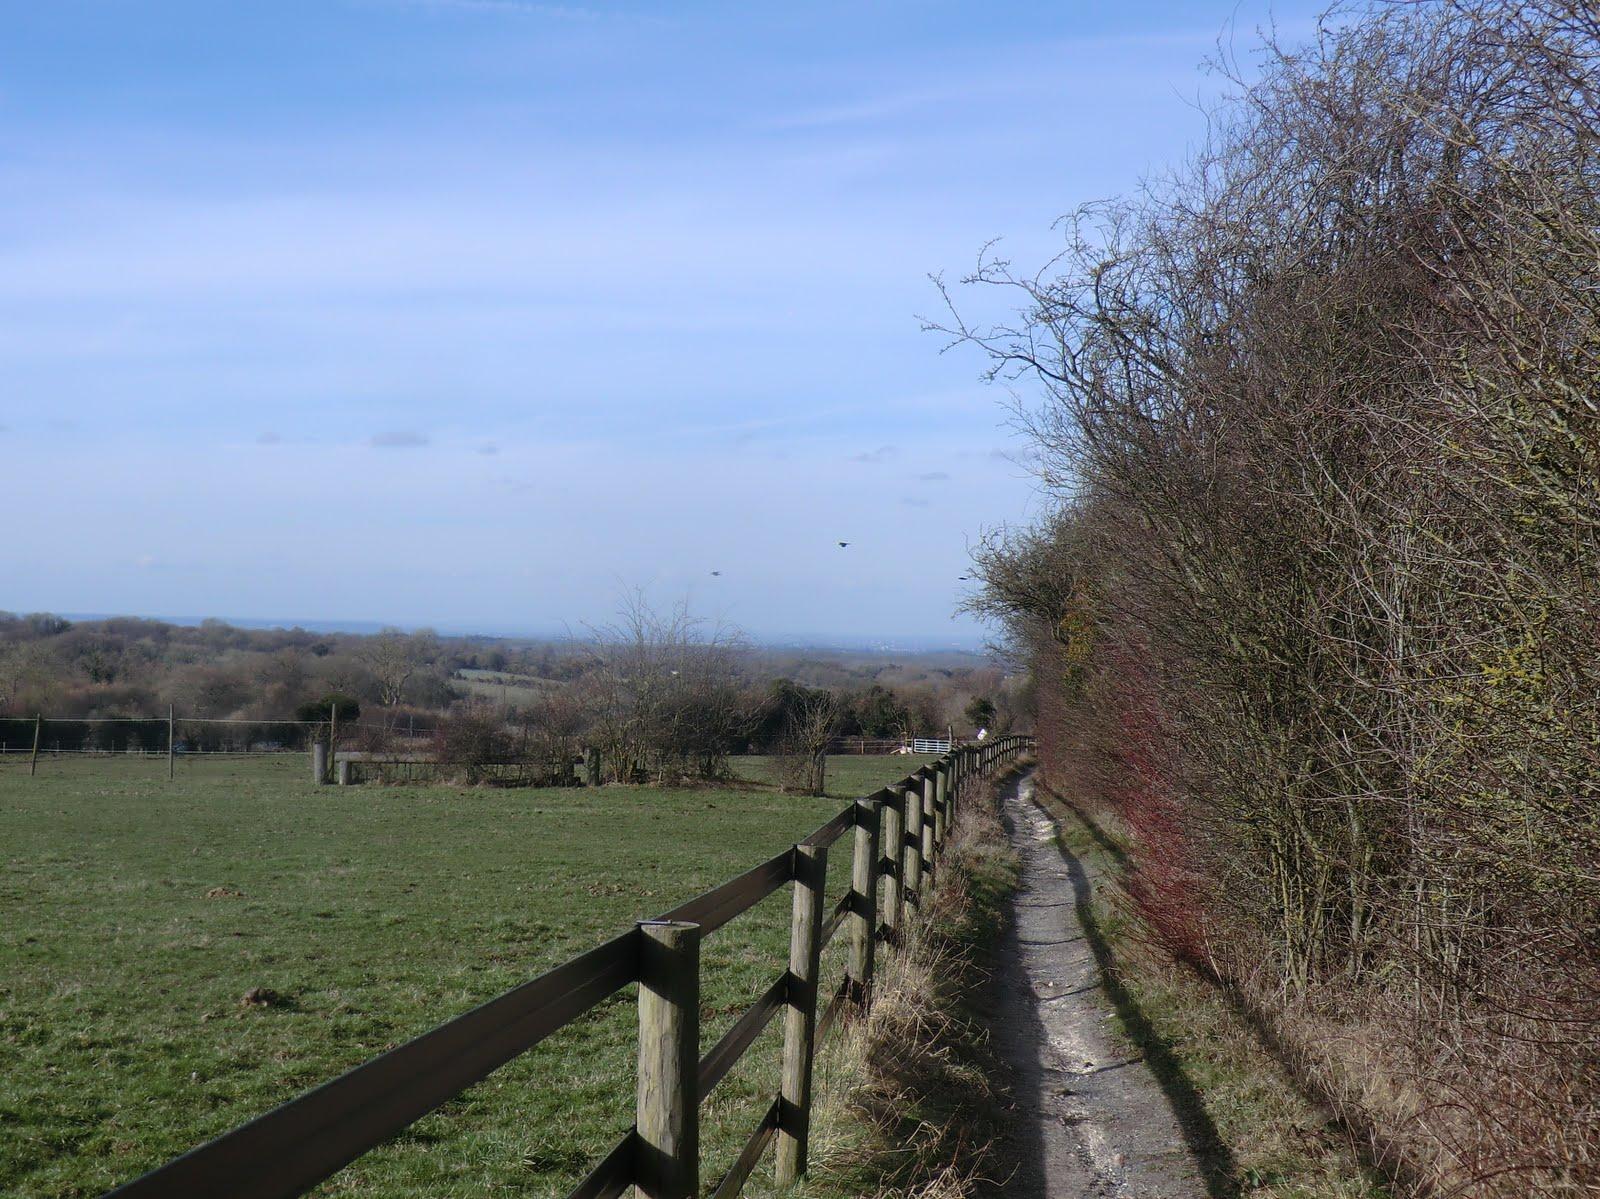 CIMG3645 Bridleway to Nohome Farm